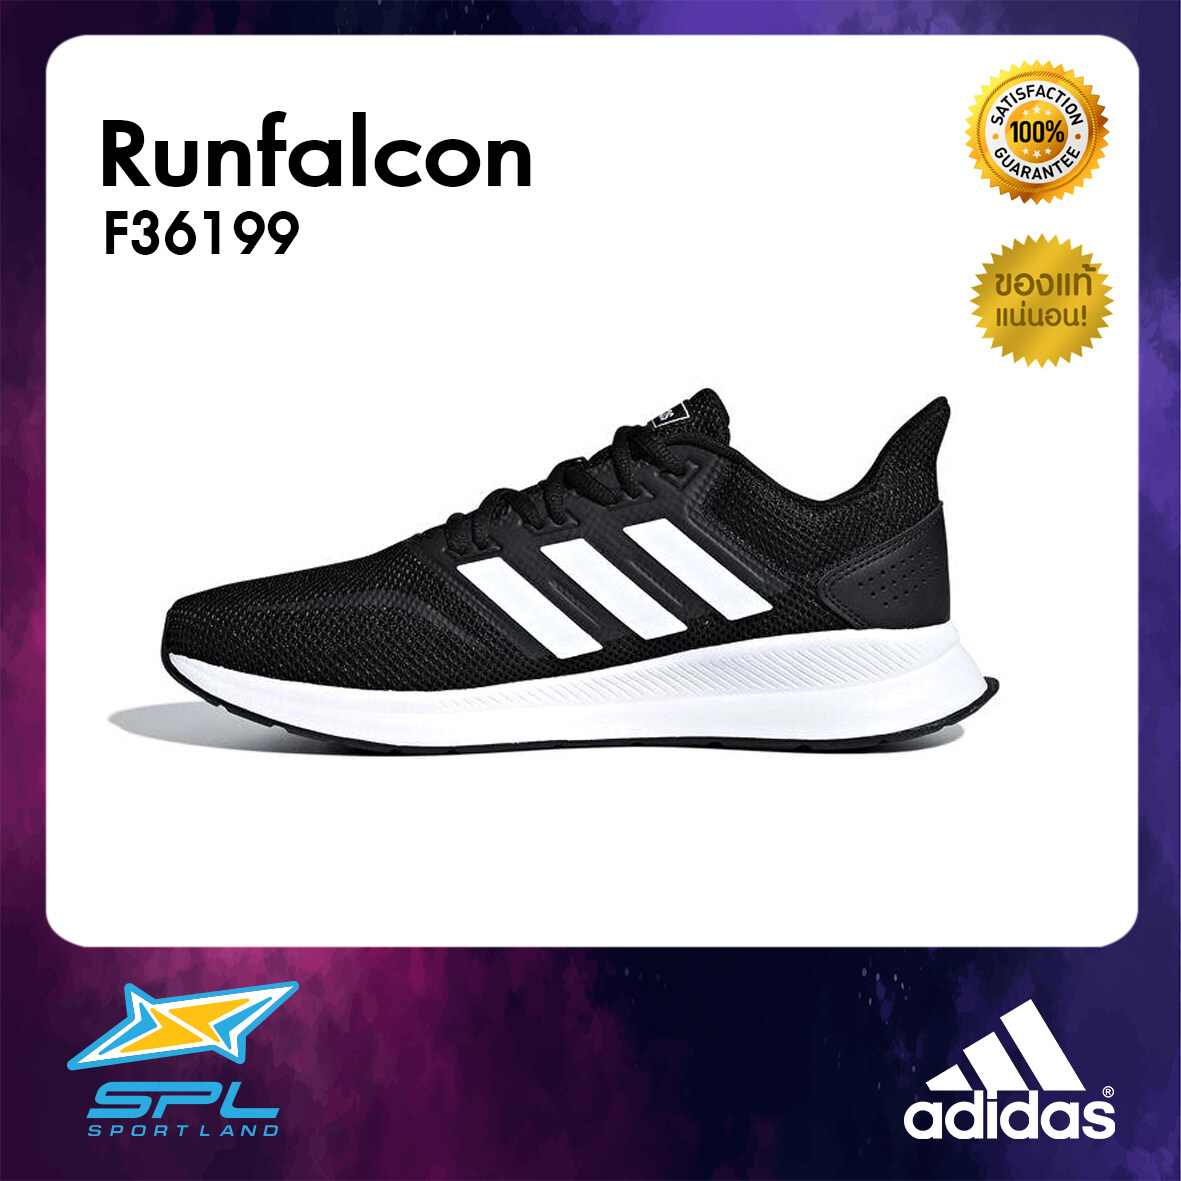 Adidas รองเท้า วิ่ง อาดิดาส Running M Shoe Runfalcon F36199 (2000).